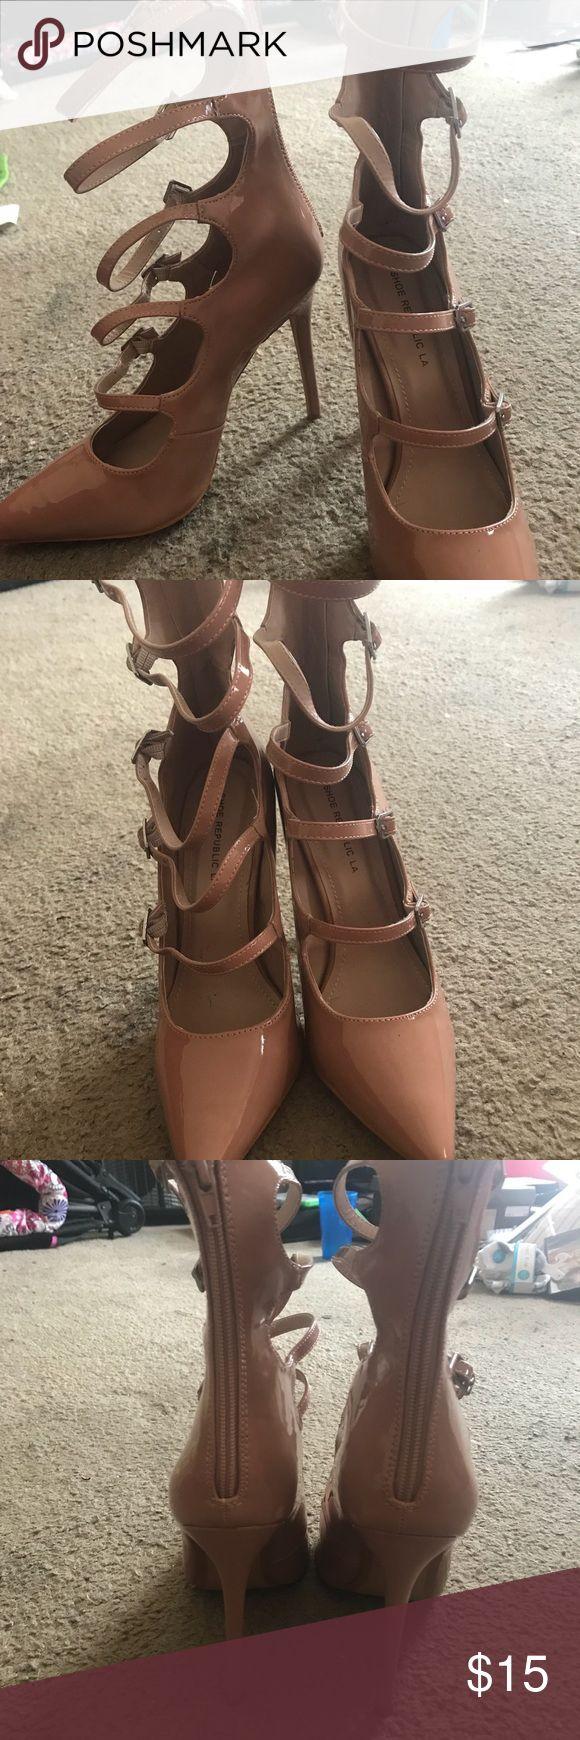 Strap up Heel Cute Nude Strap Up Heel Shoe Republic LA Shoes Heels